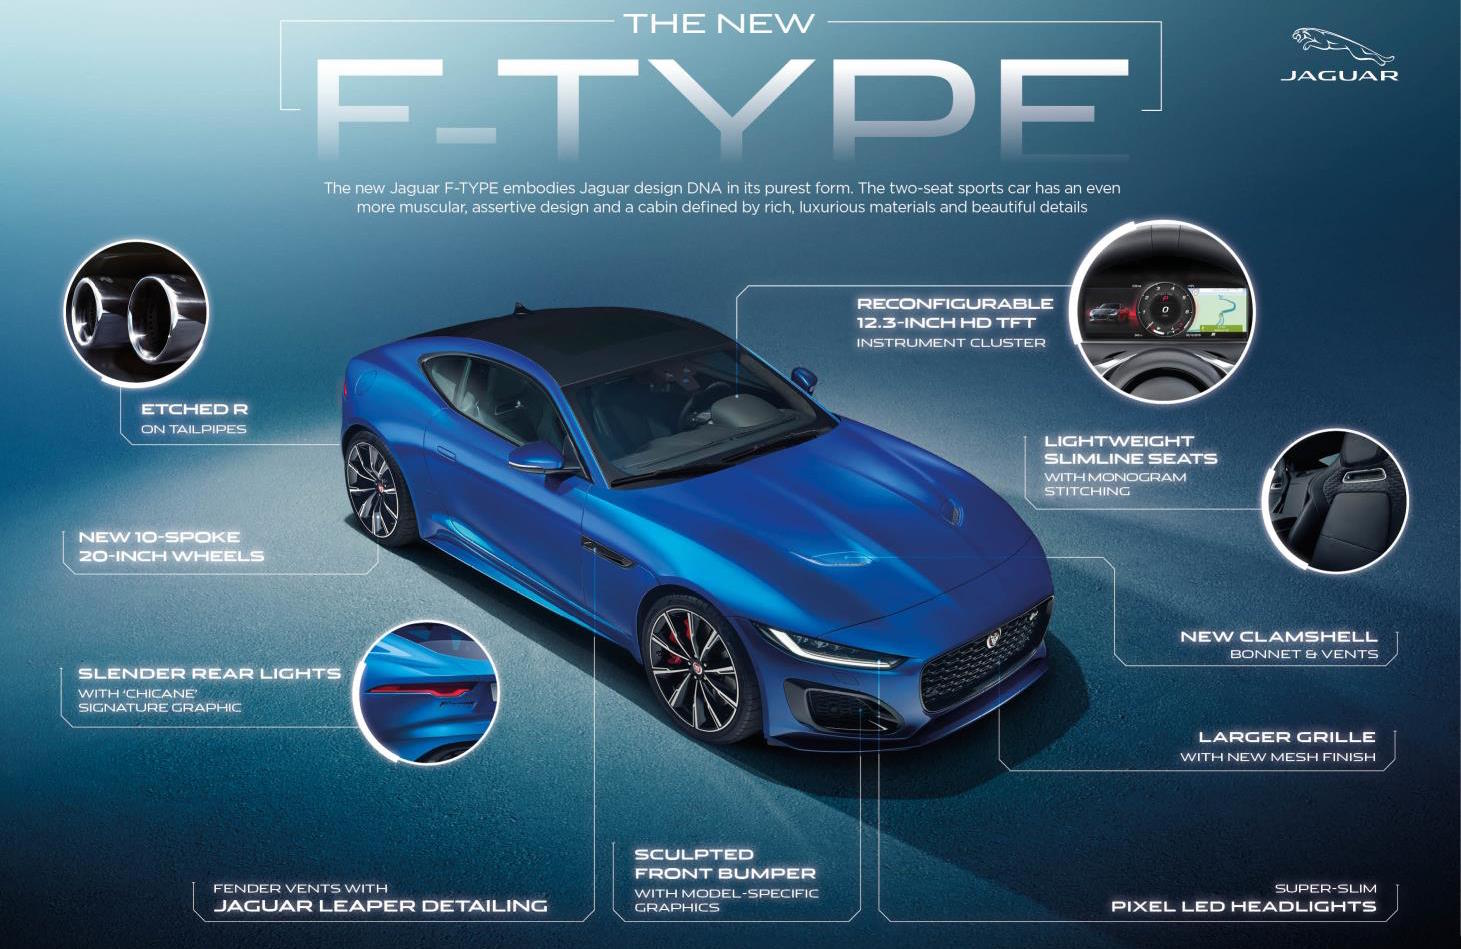 2021 jaguar f type exhaust - specs, interior redesign